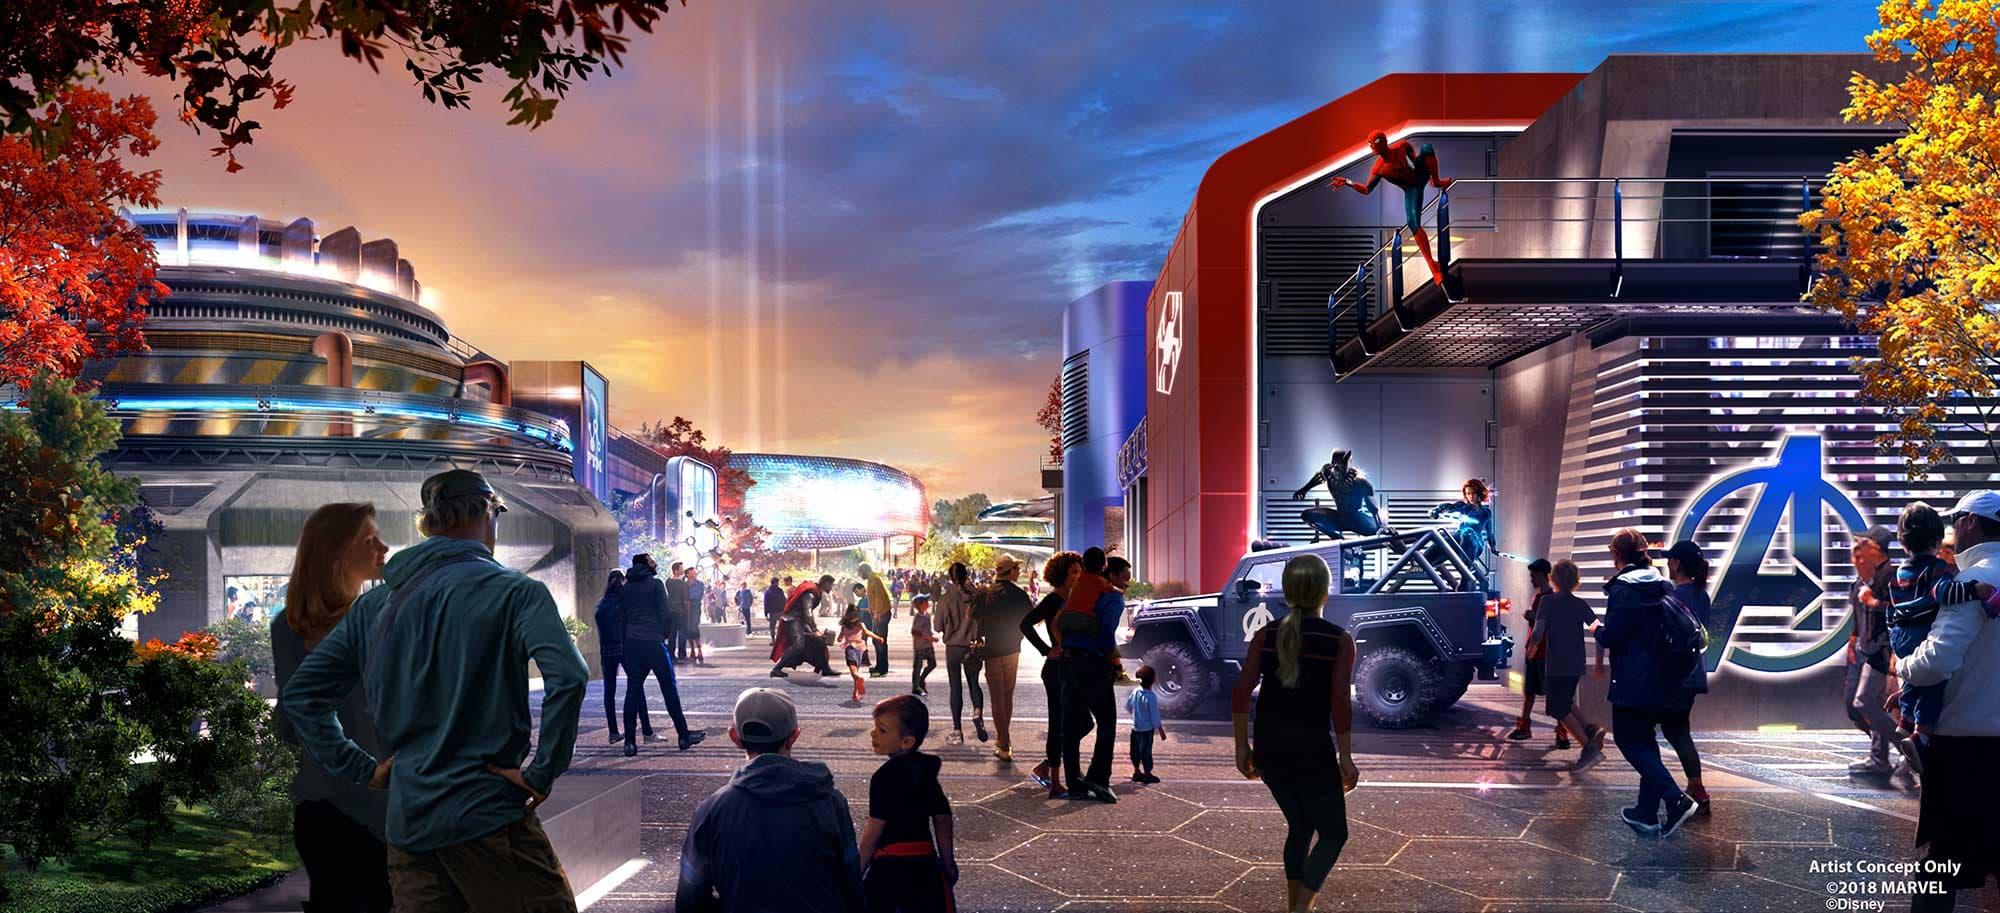 Artist Concept for Disneyland Paris